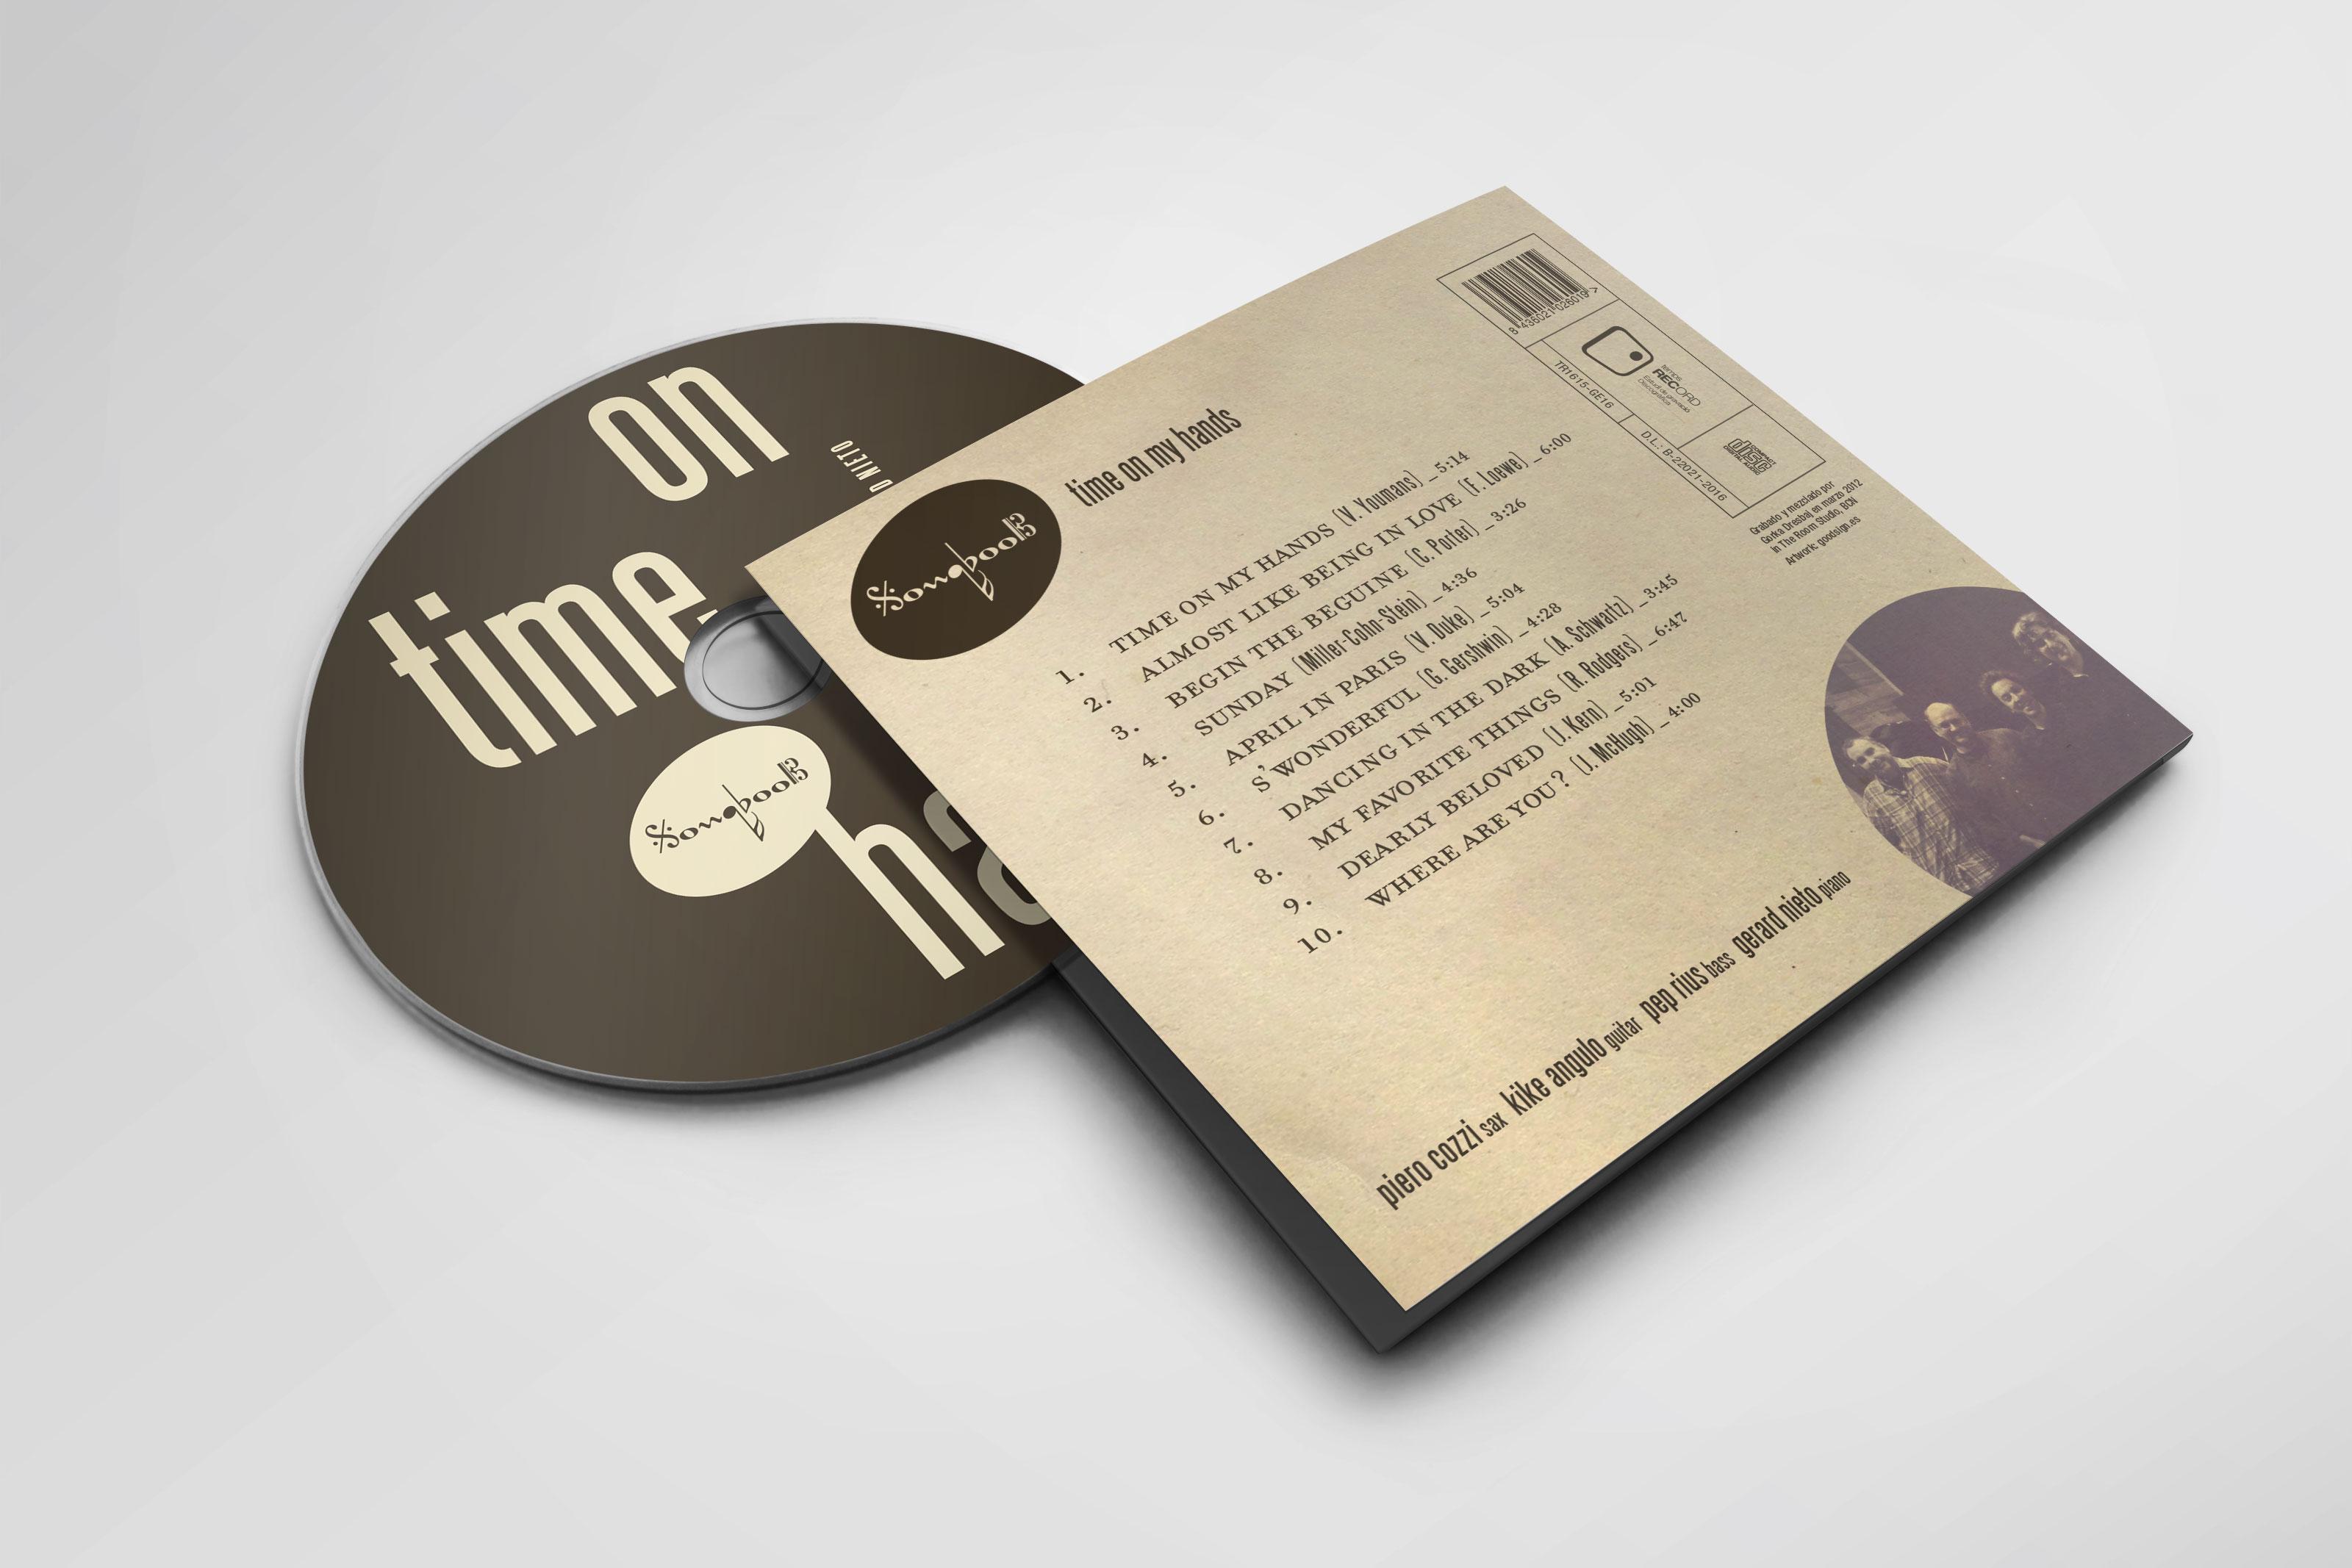 cd songbook vol.2